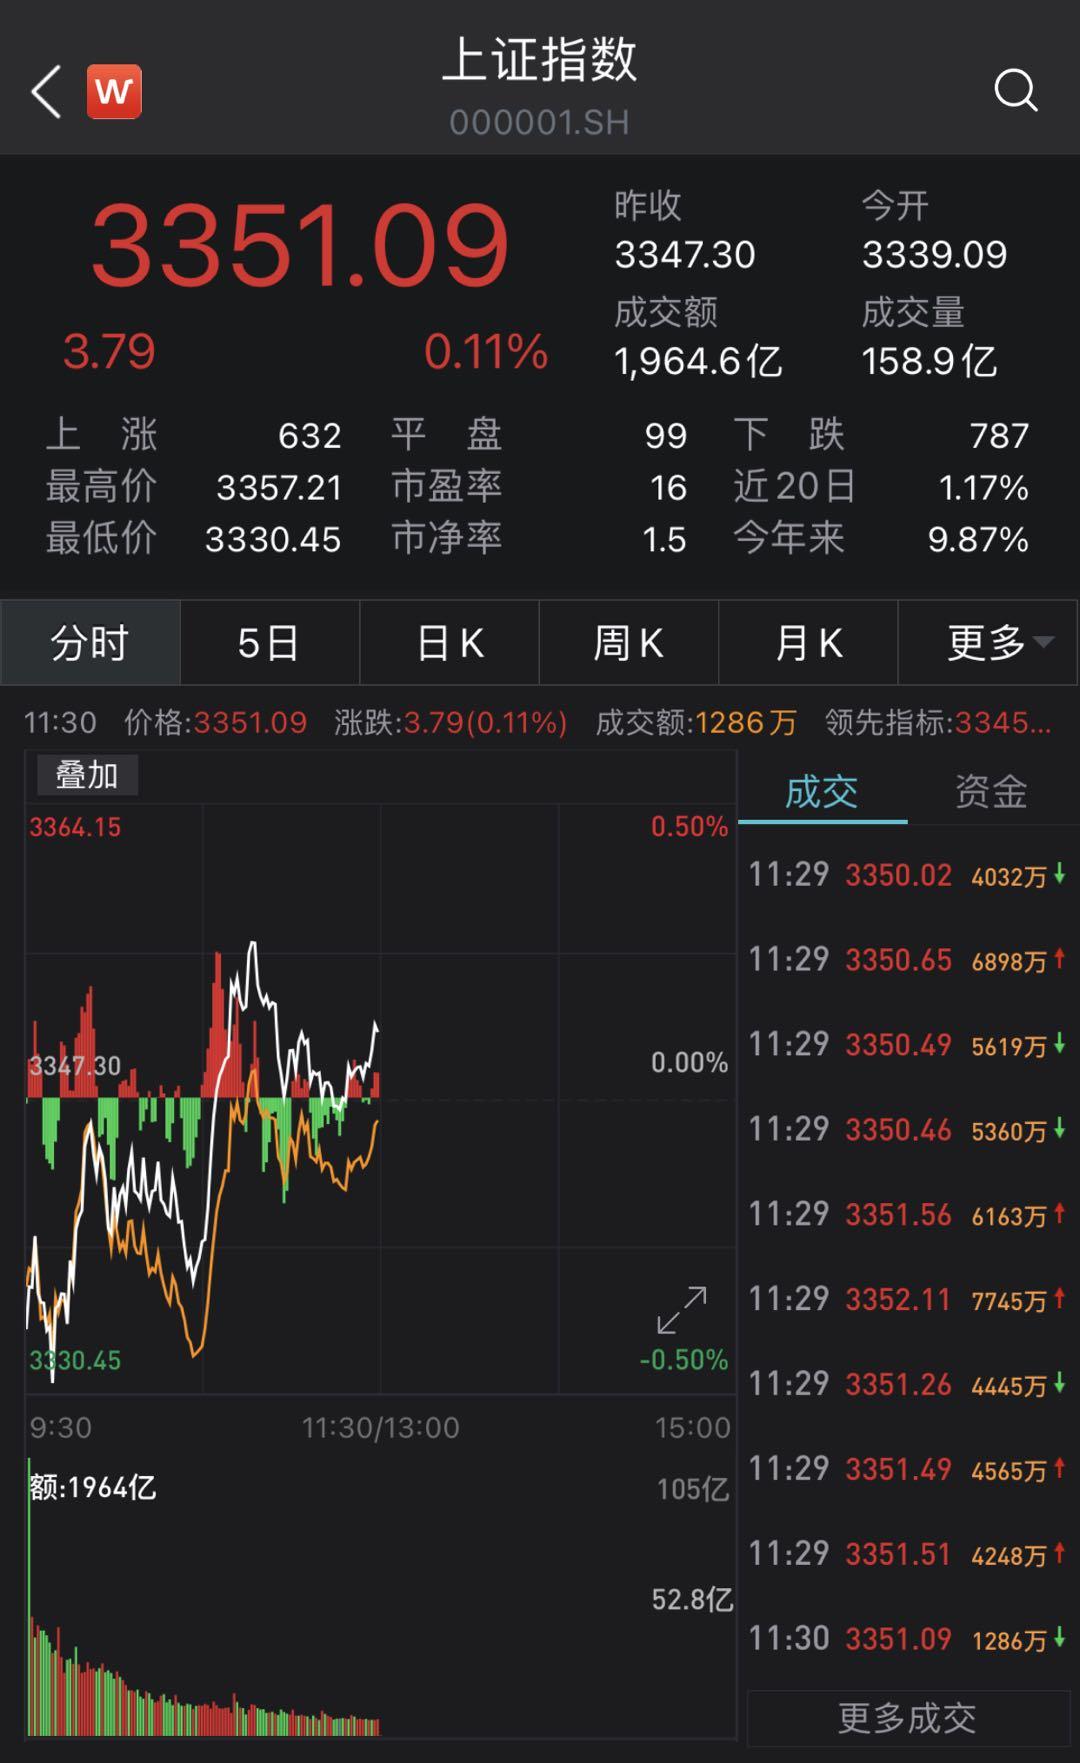 A股三大股指集体翻红:沪指涨0.11% 白酒股大涨